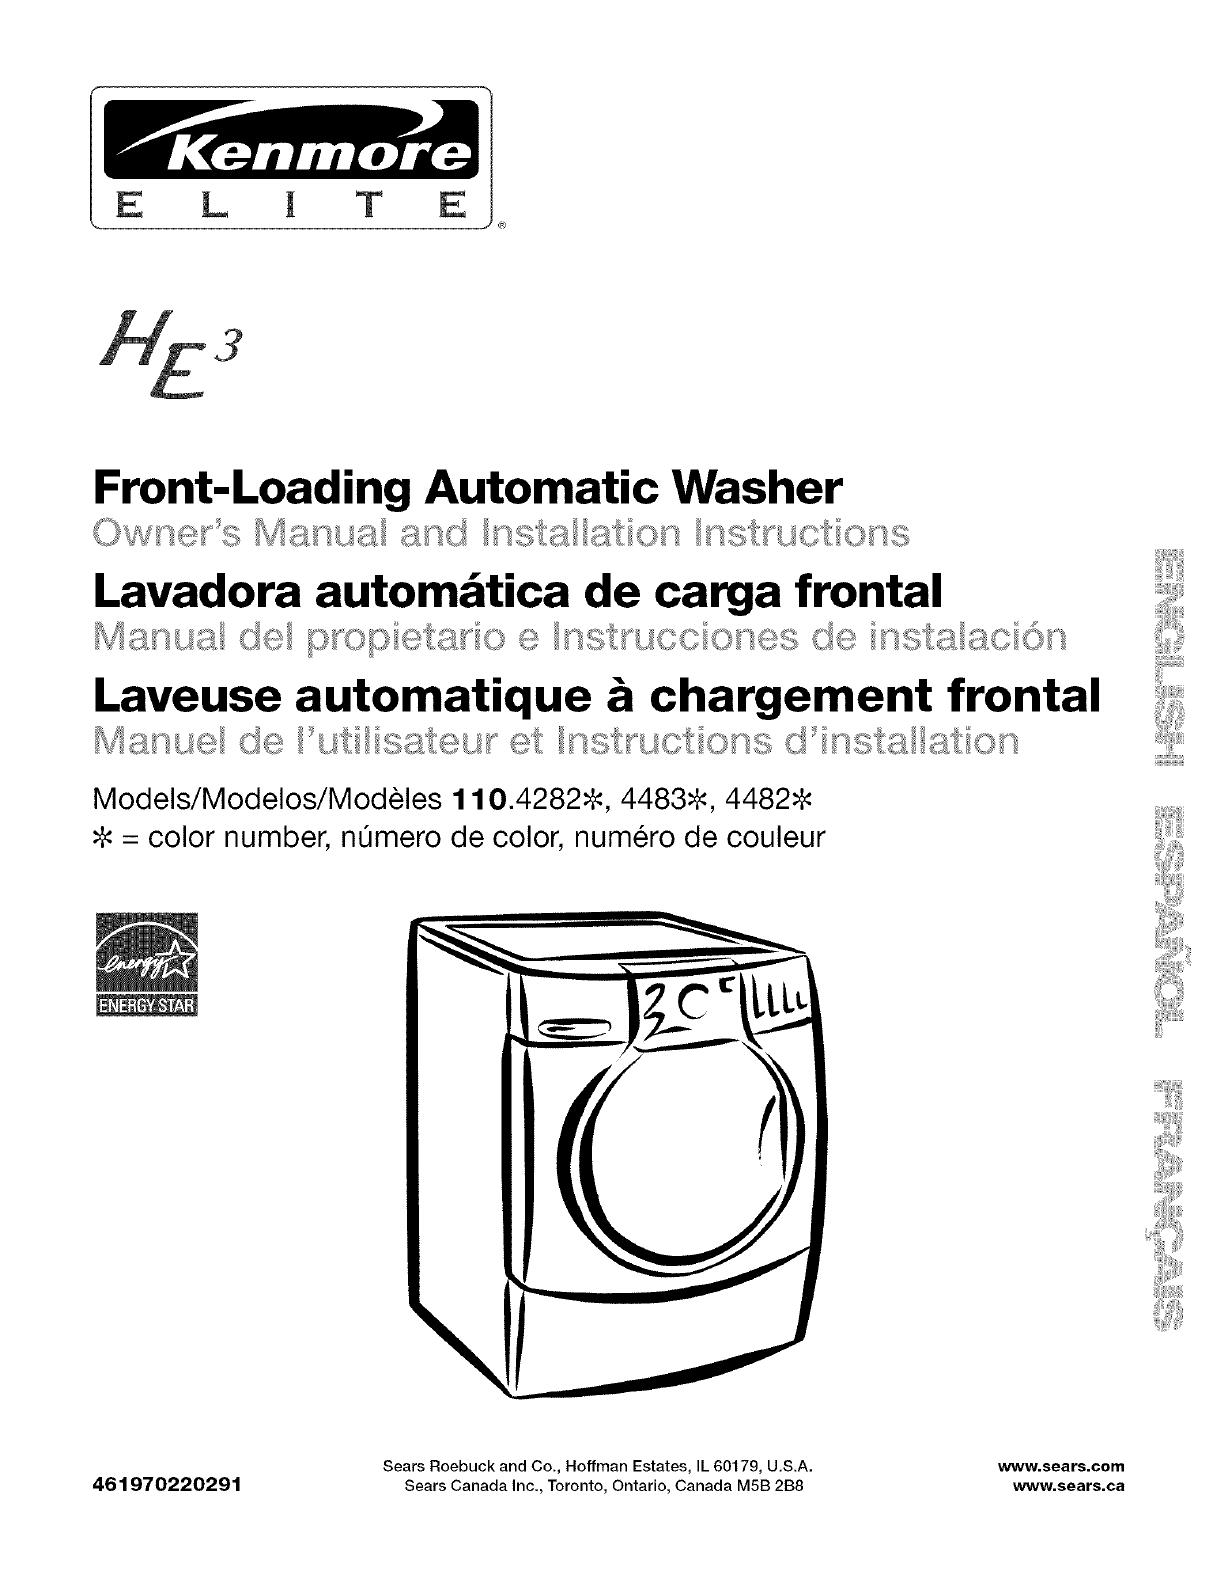 kenmore elite 11042822202 user manual automatic washer horizontal rh usermanual wiki Kenmore Washer Repair Manual kenmore elite owners manual refrigerator